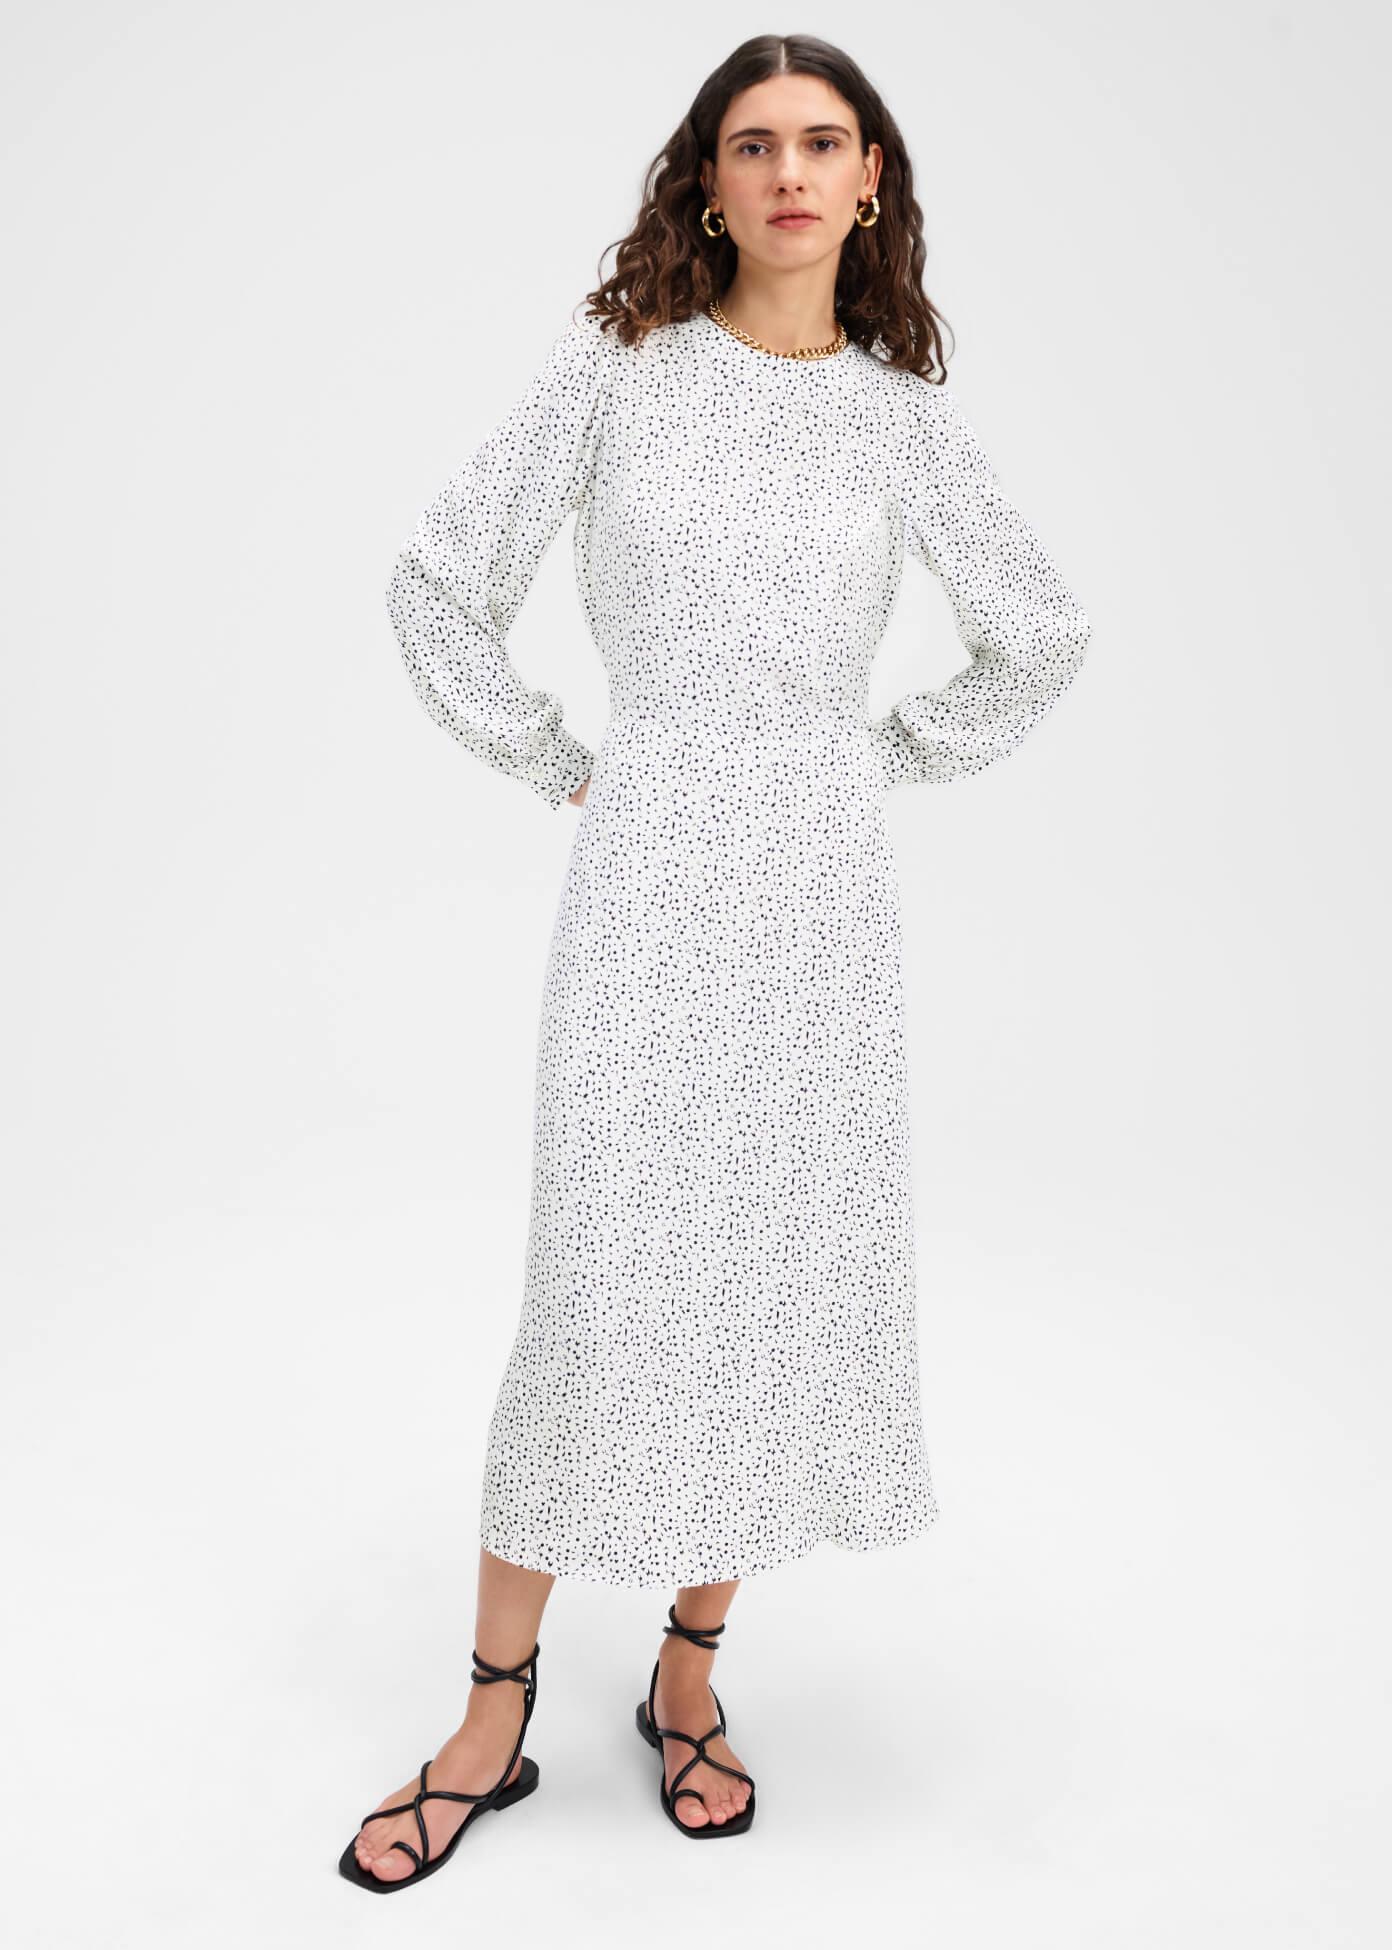 Citrine Printed Dress